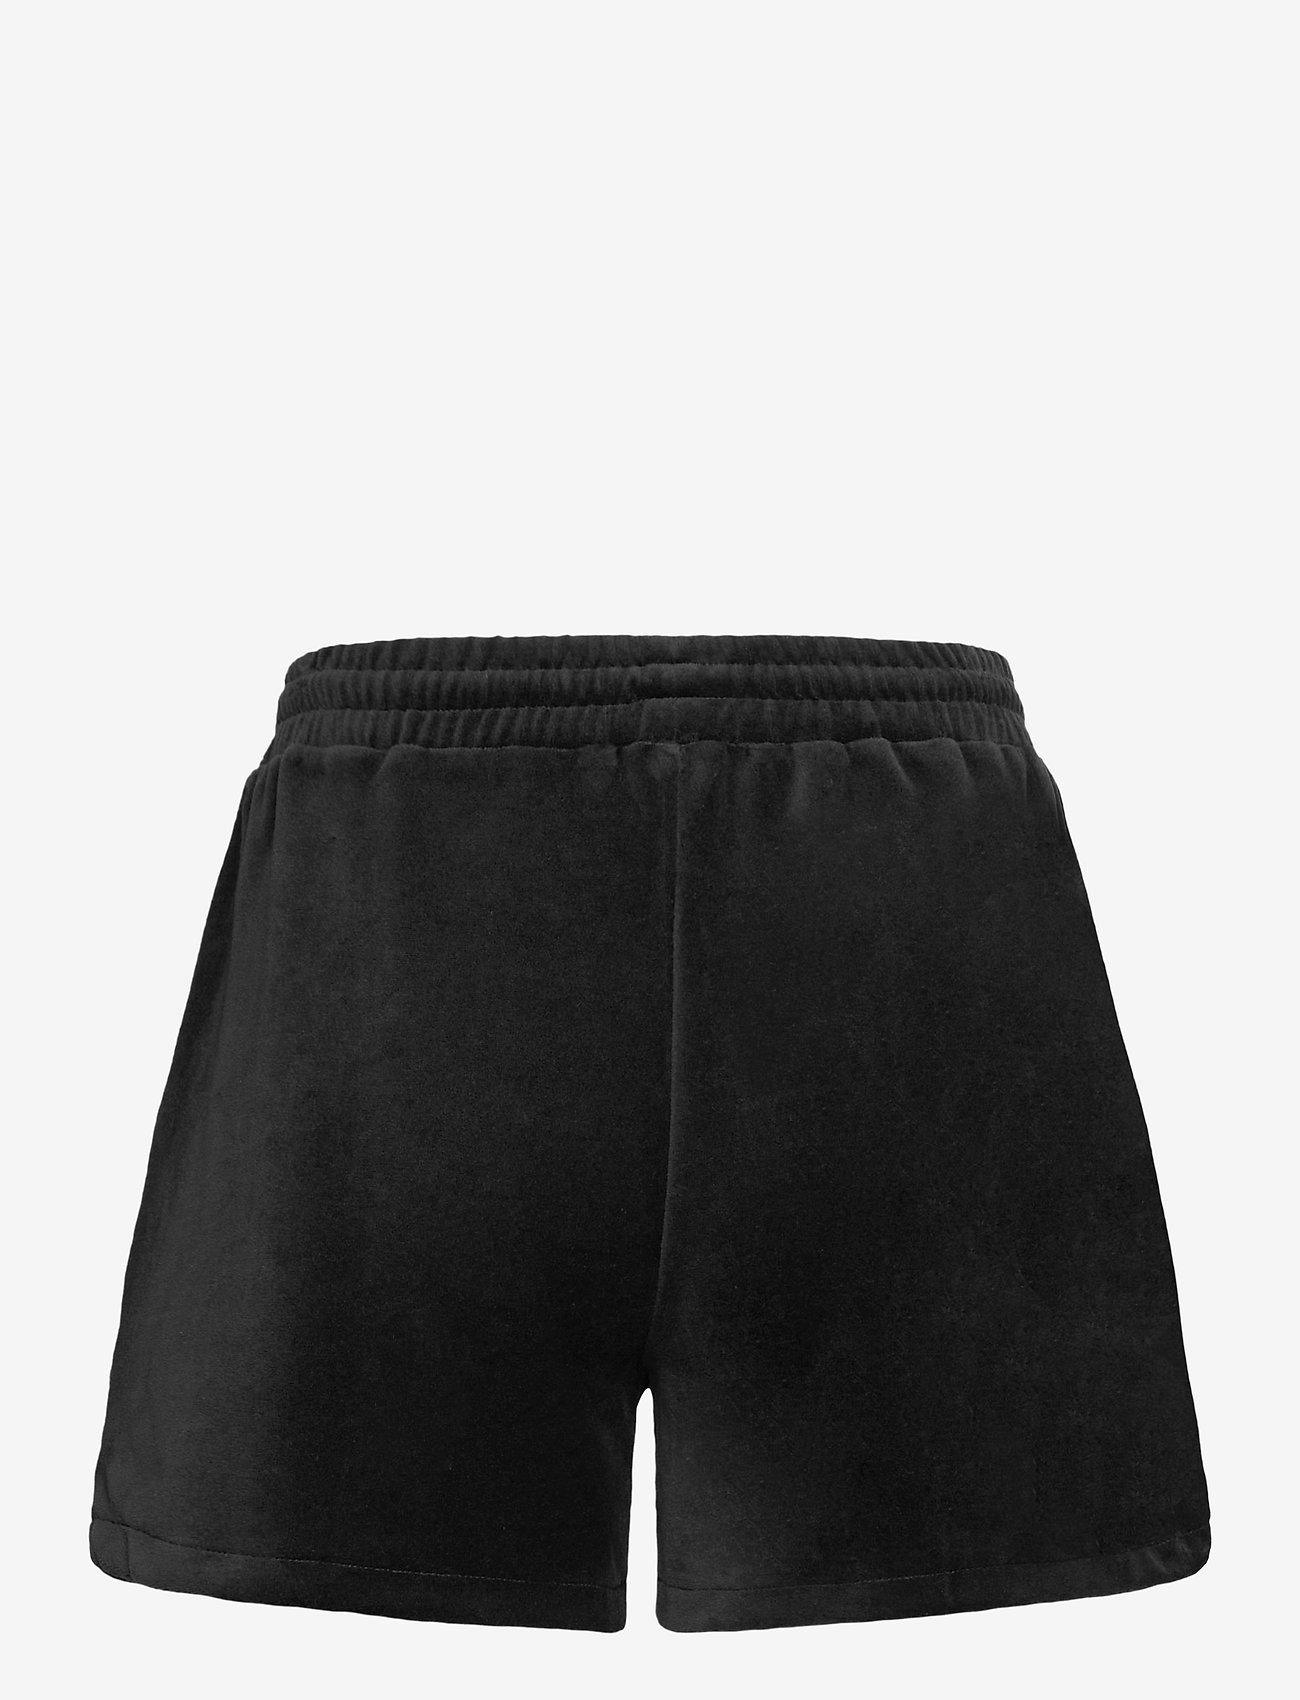 Rosemunde - Shorts - casual shorts - black - 1